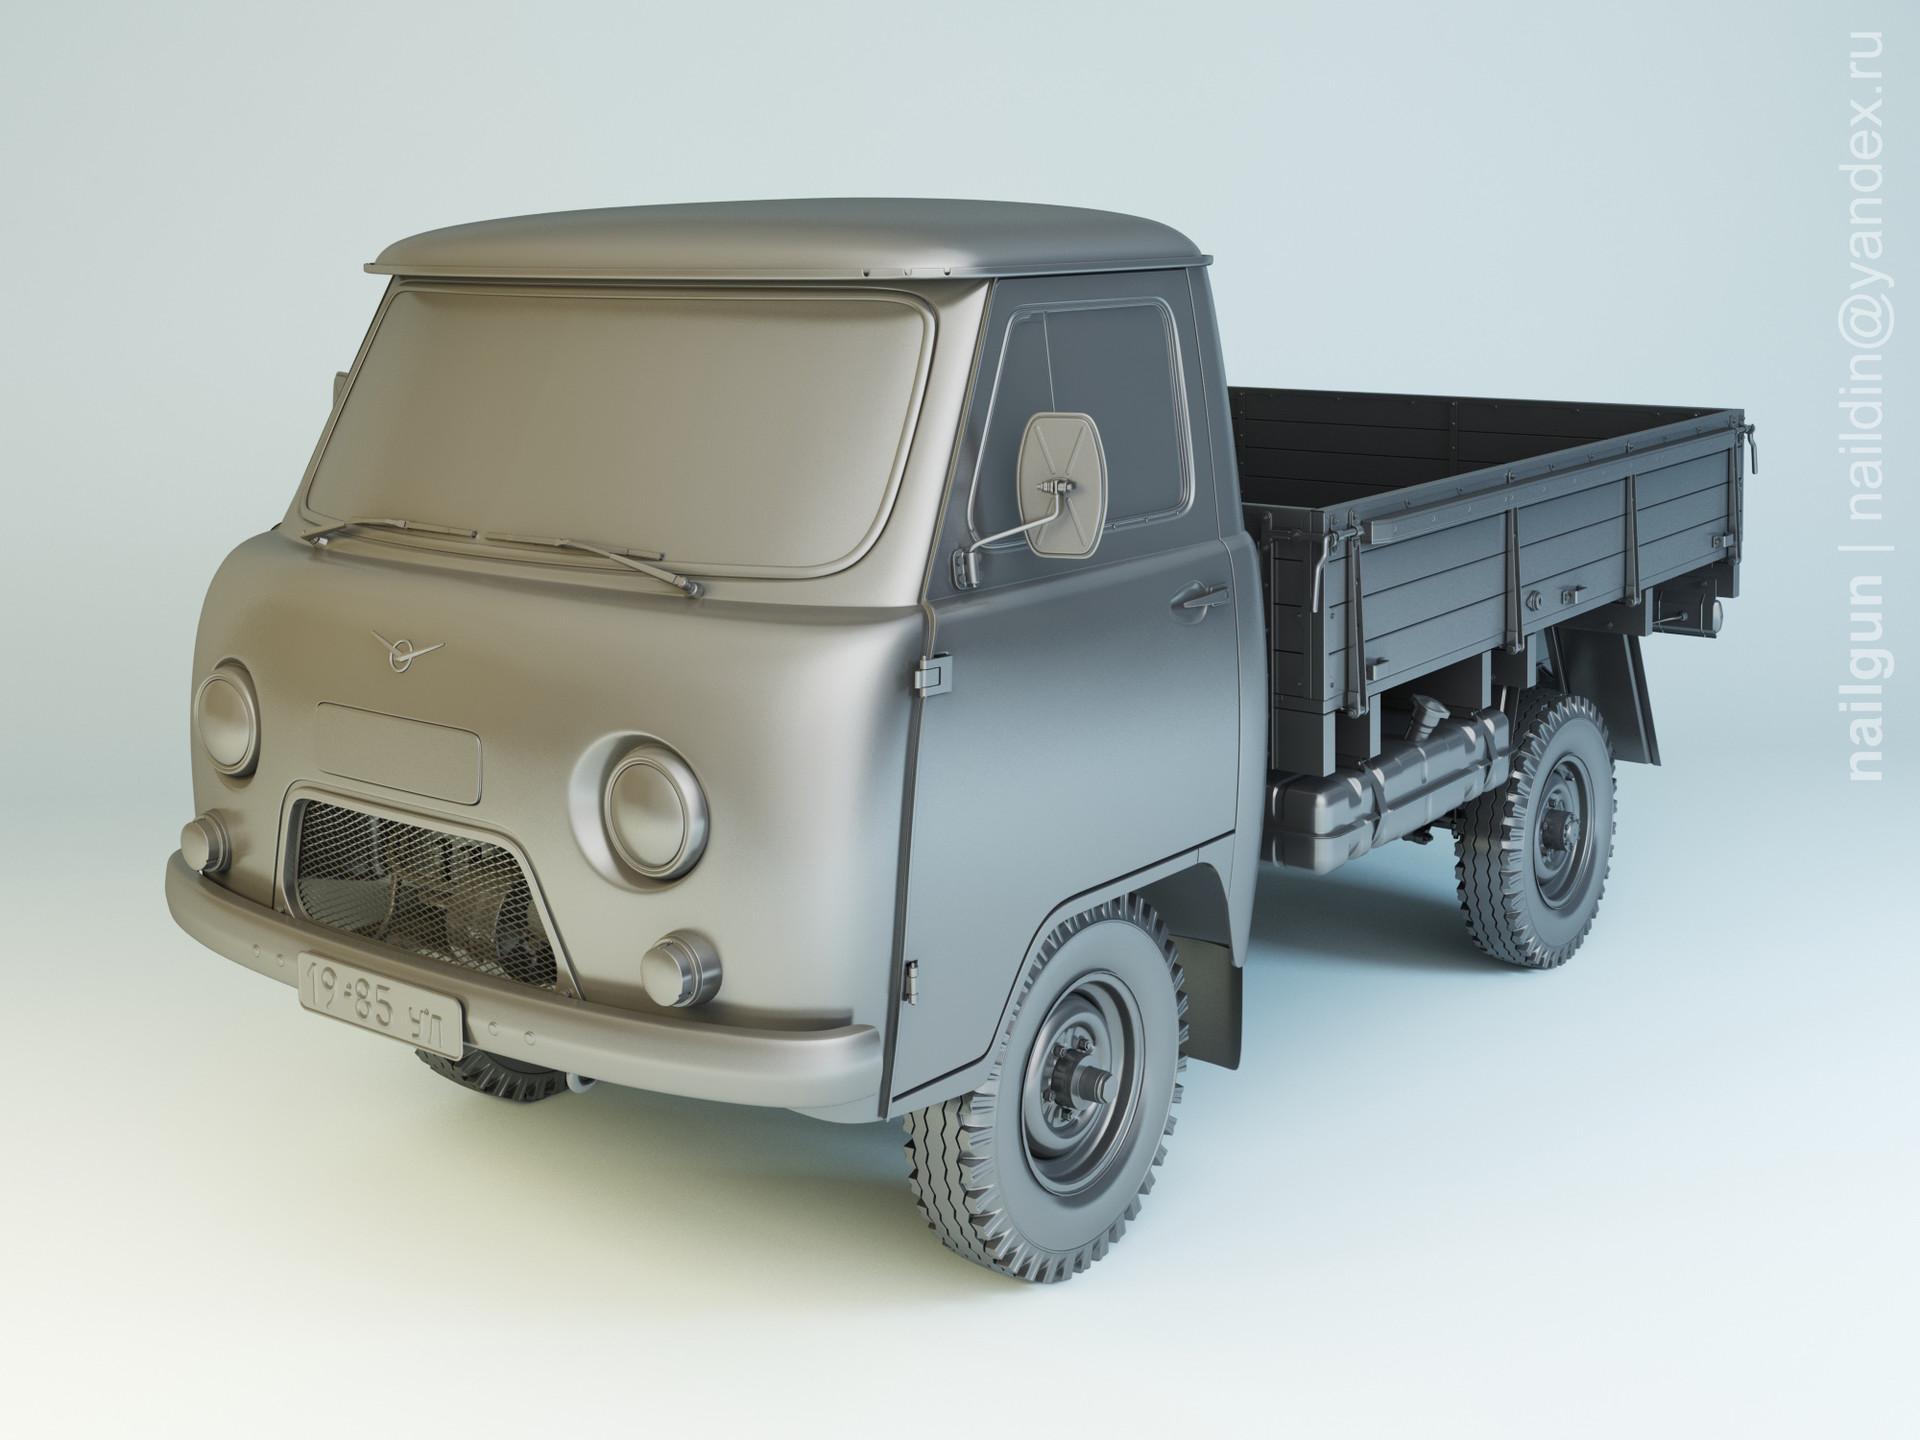 Nail khusnutdinov al 101 008 uaz 3303 modelling 0